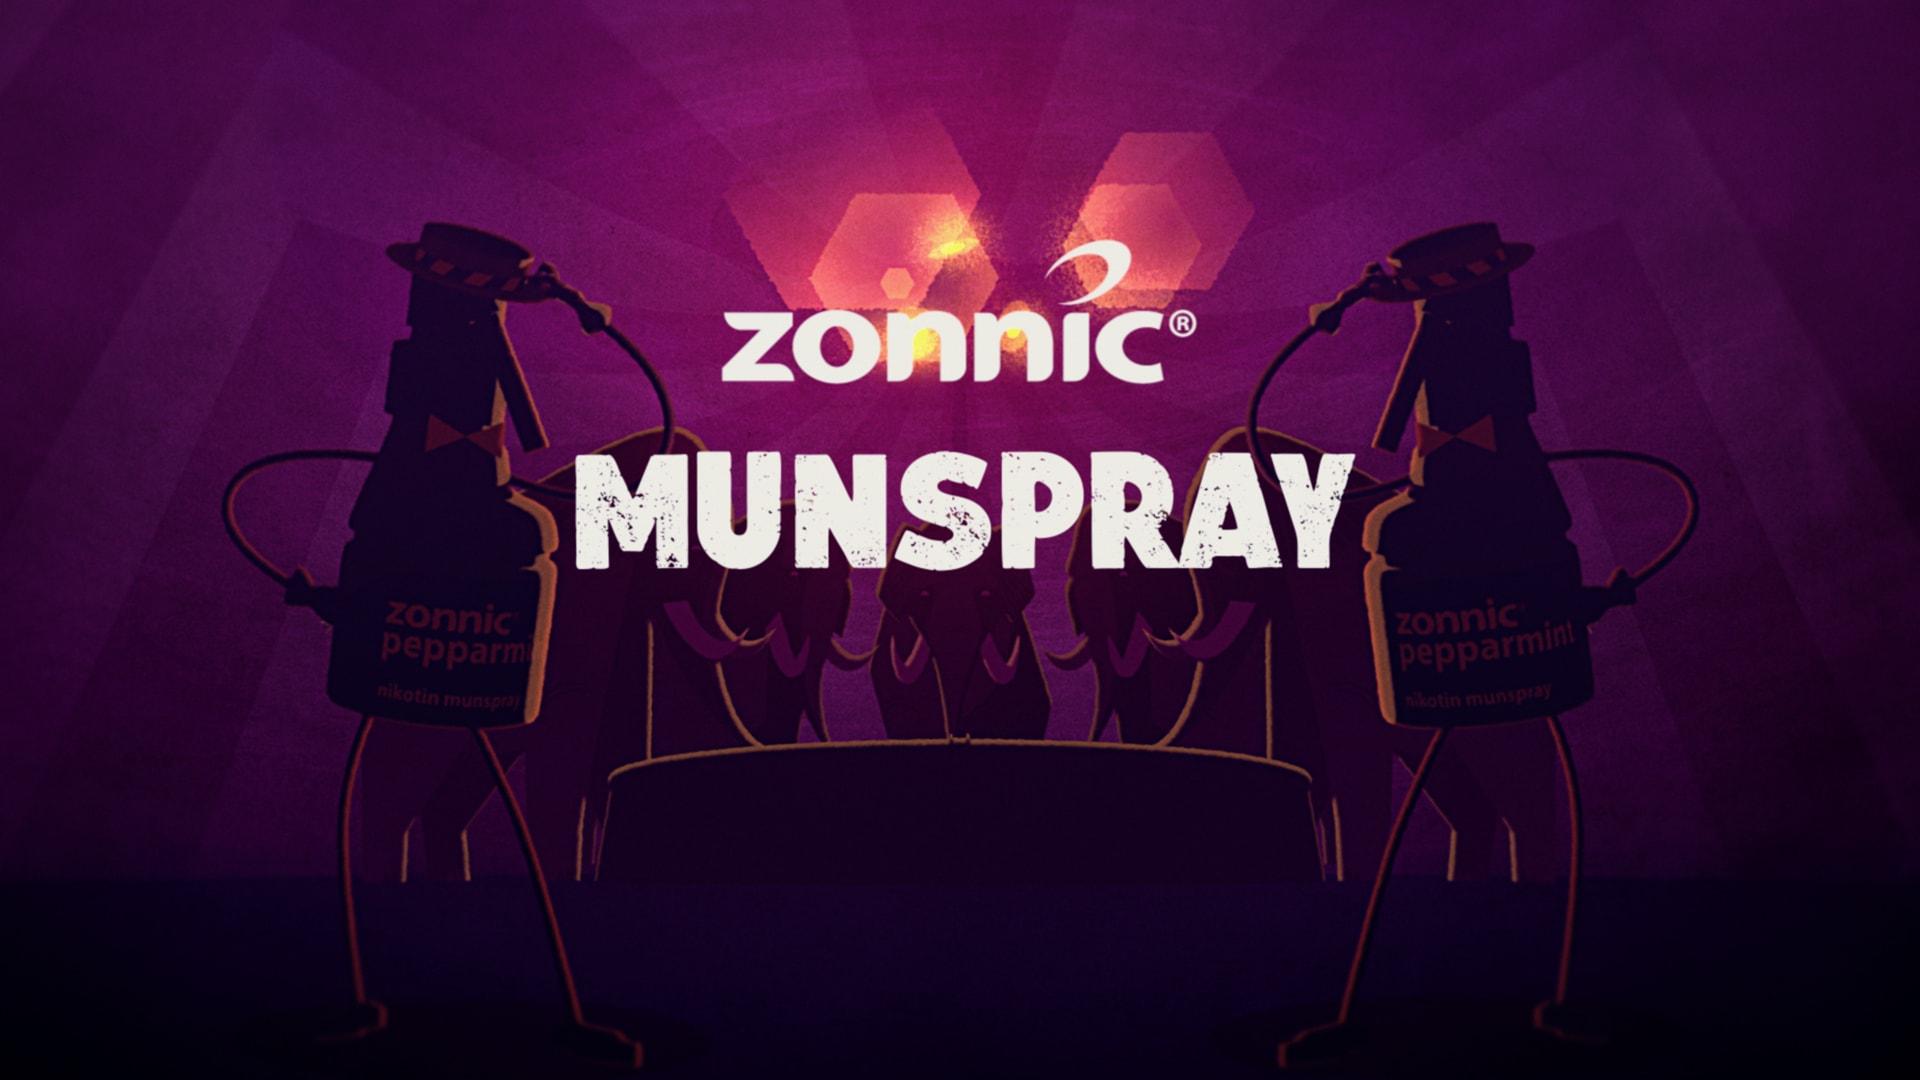 Zonnic munspray